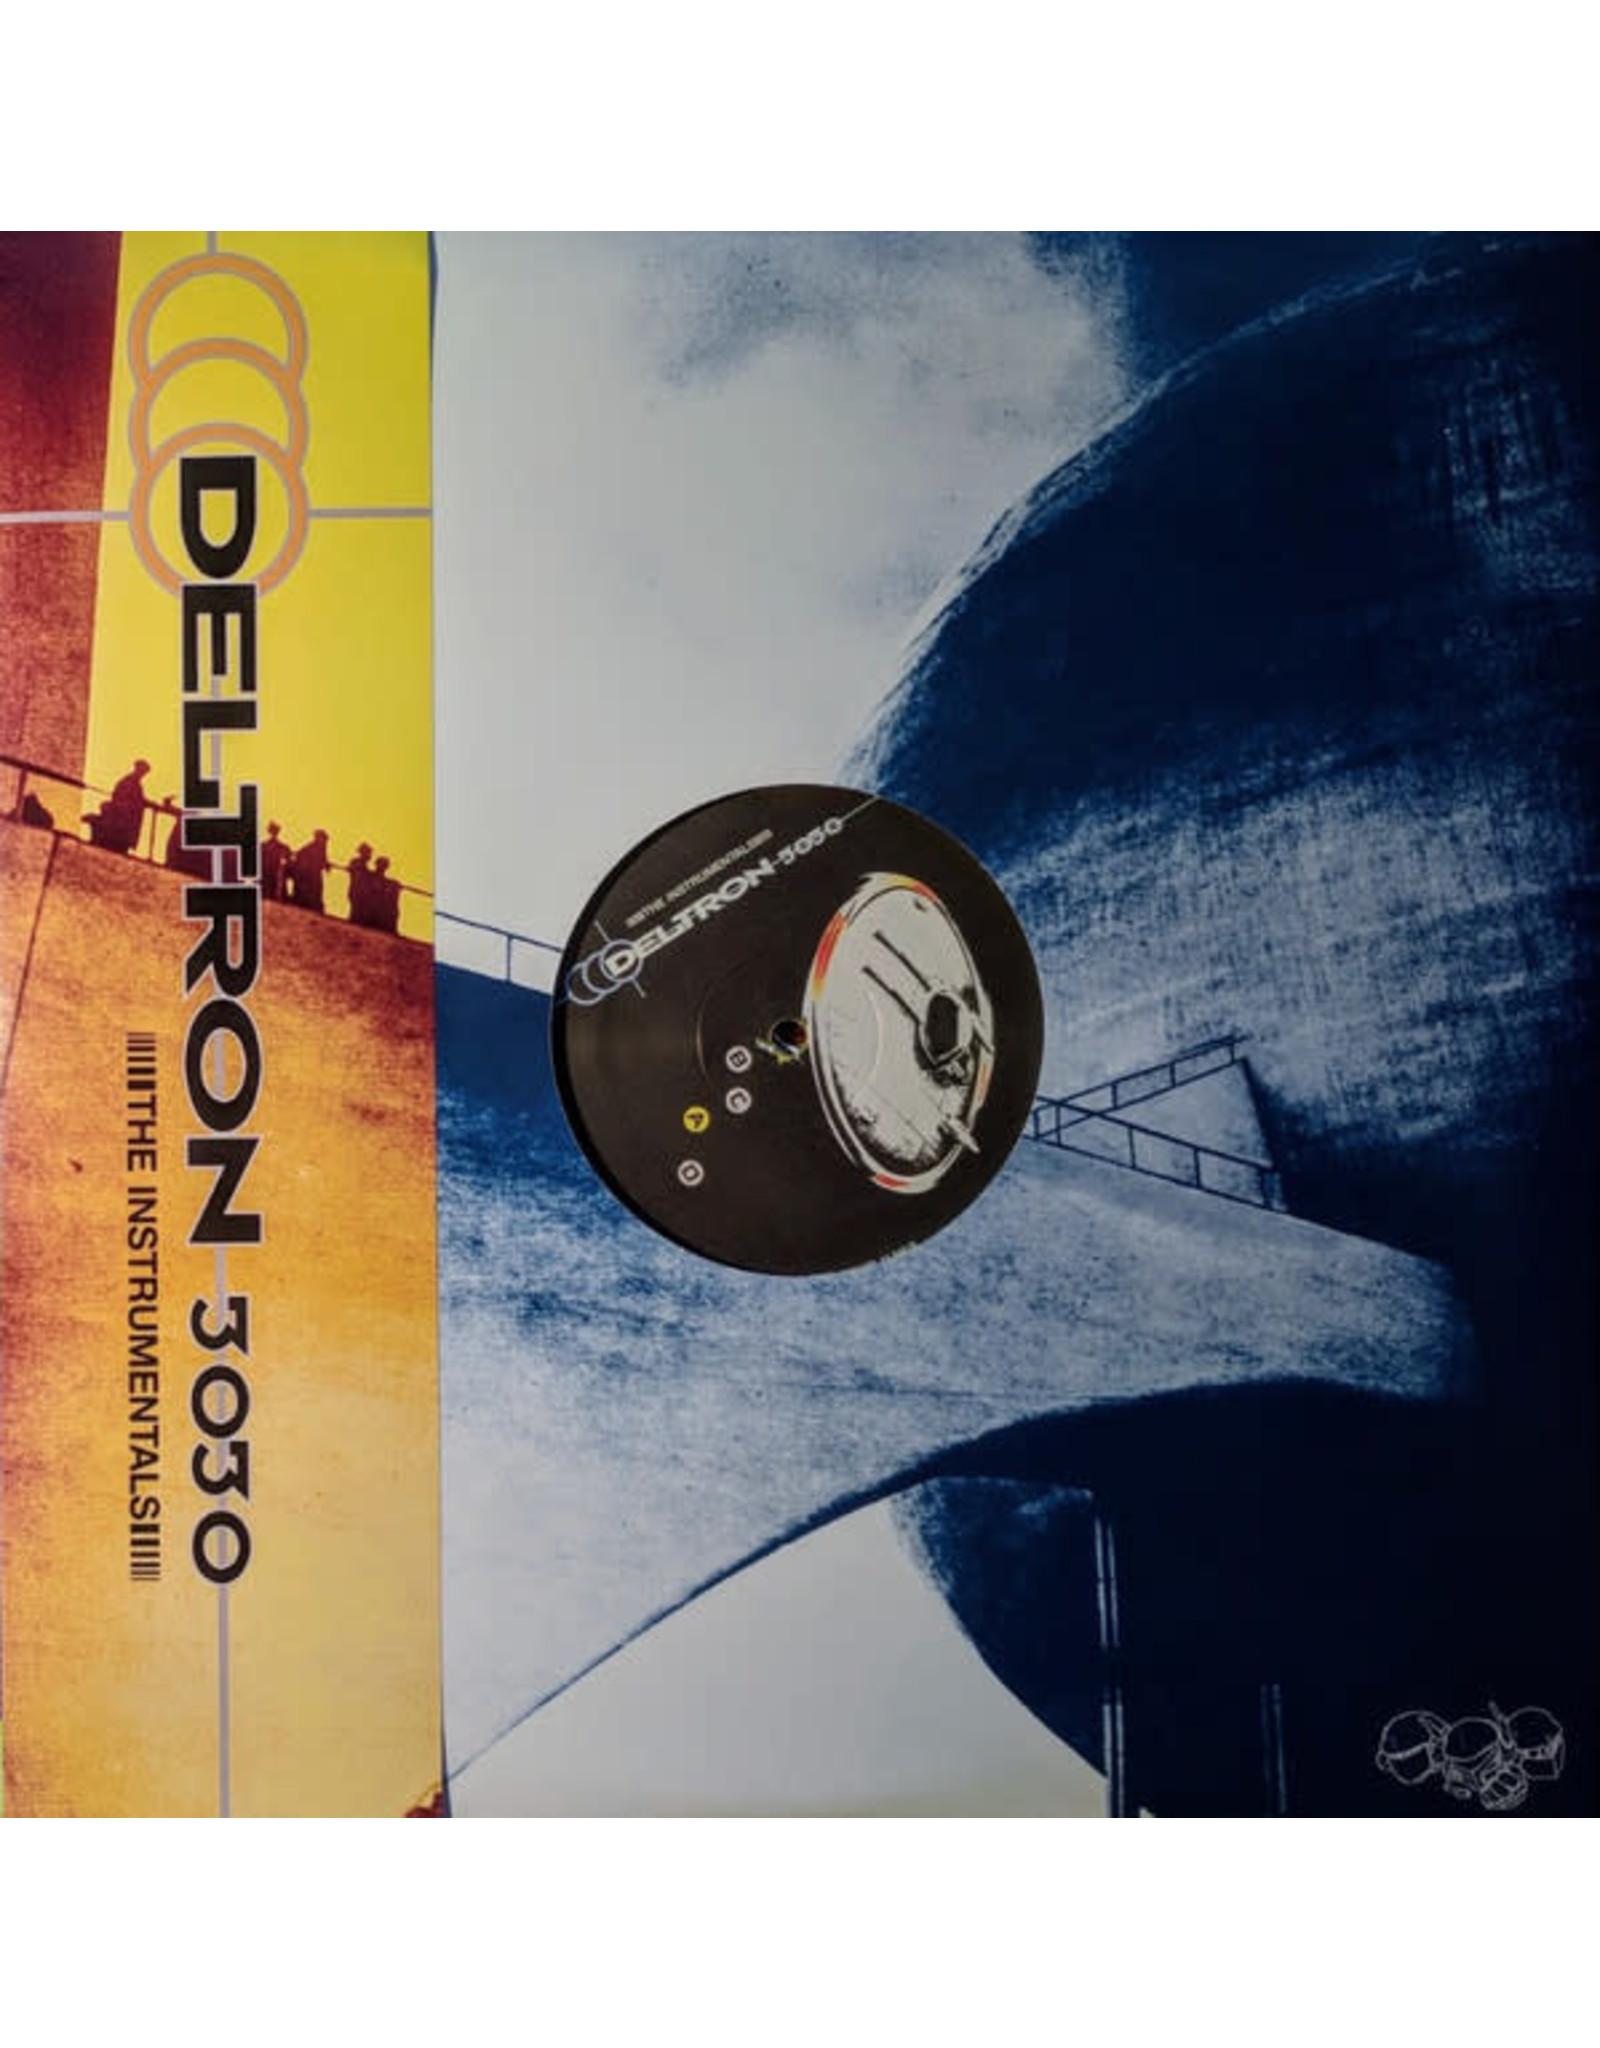 Deltron 3030 - The Instrumentals 2LP